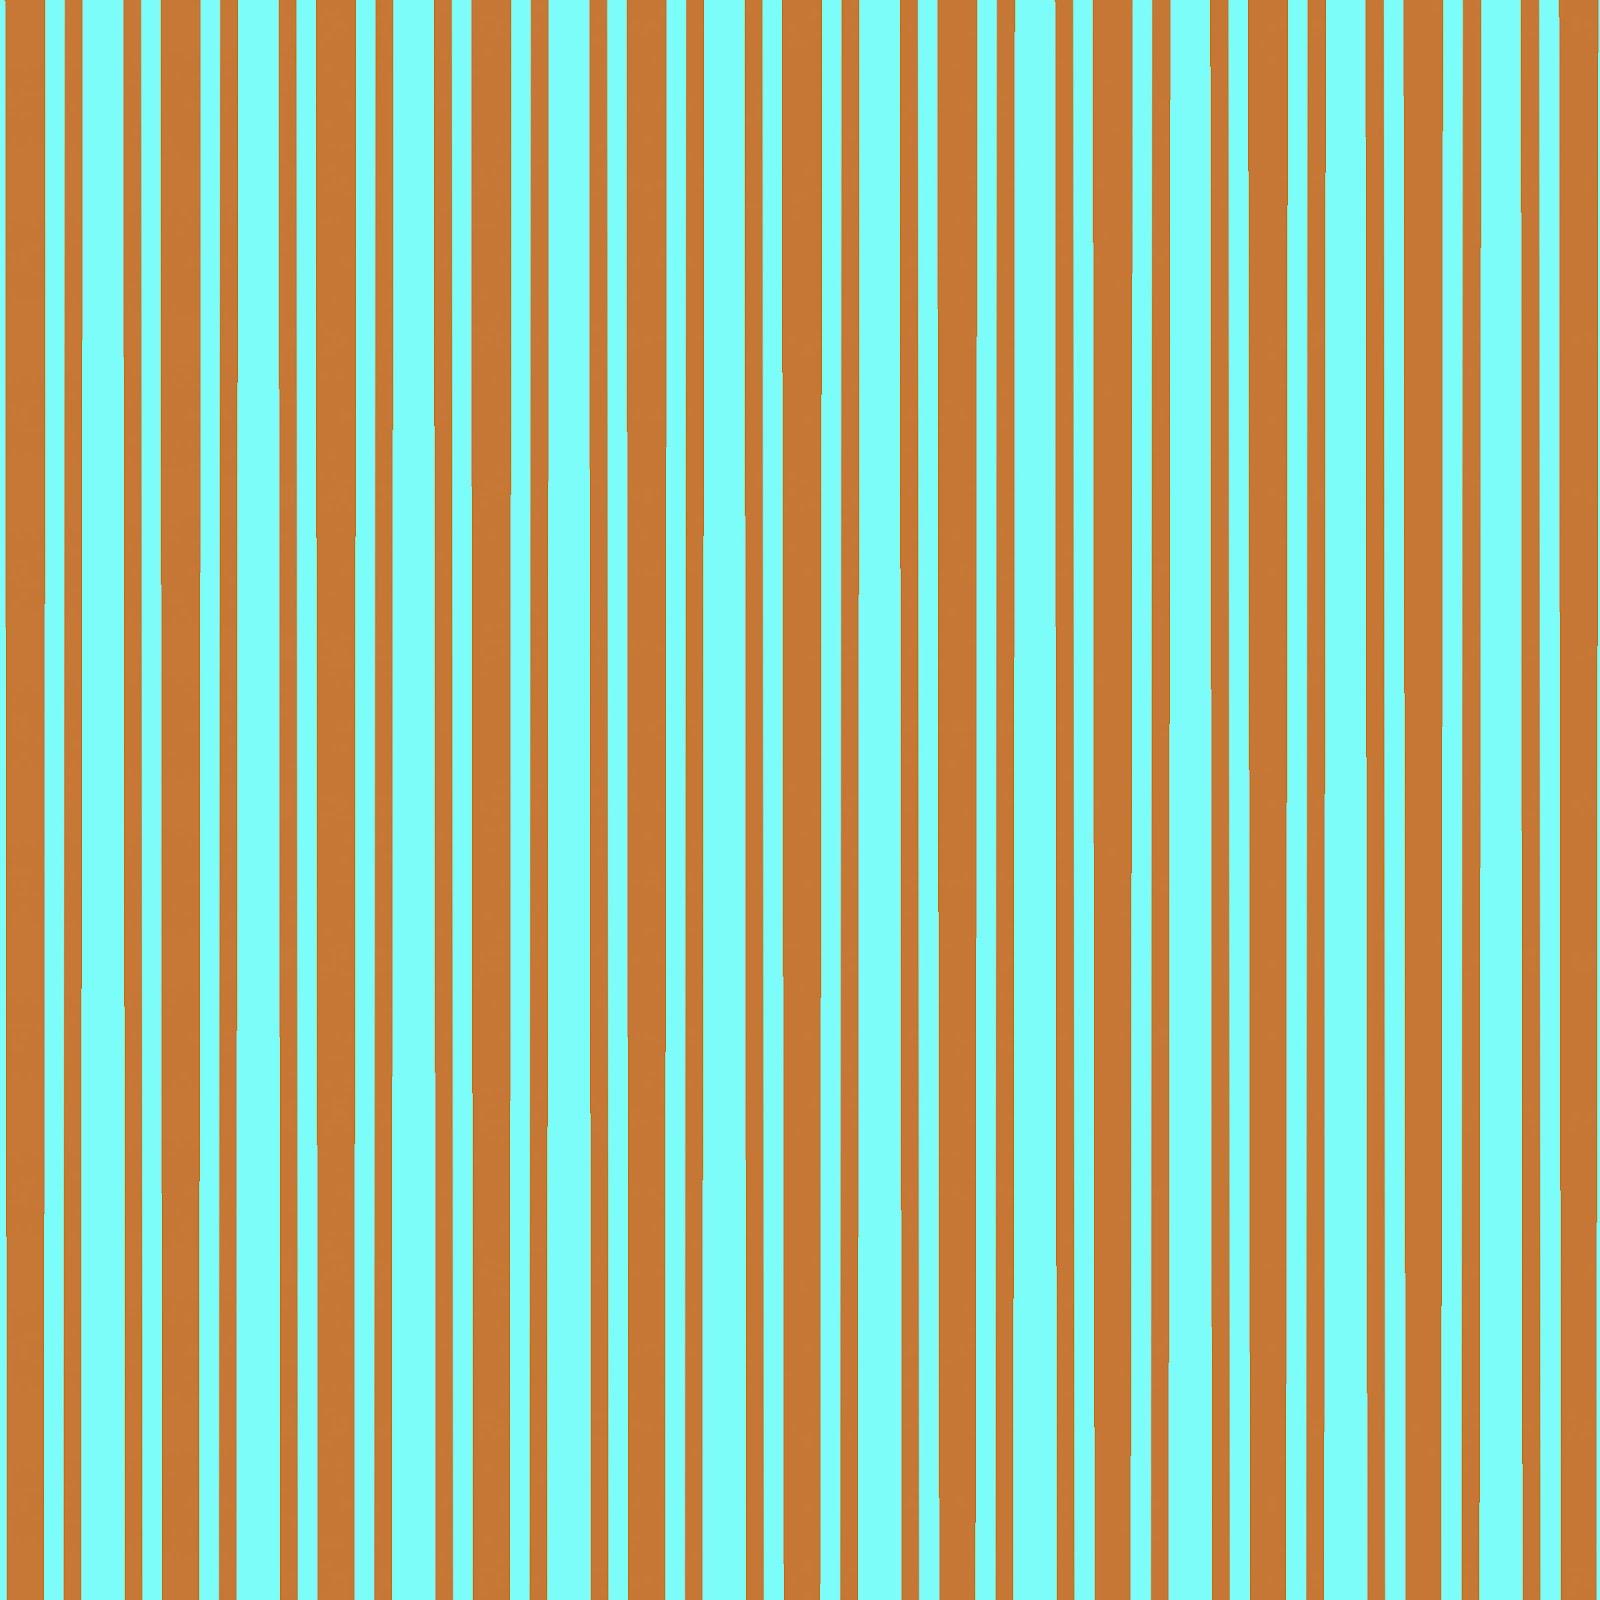 Bonjourvintage Free Digital Scrapbook Paper Turquoise And Brown Stripes